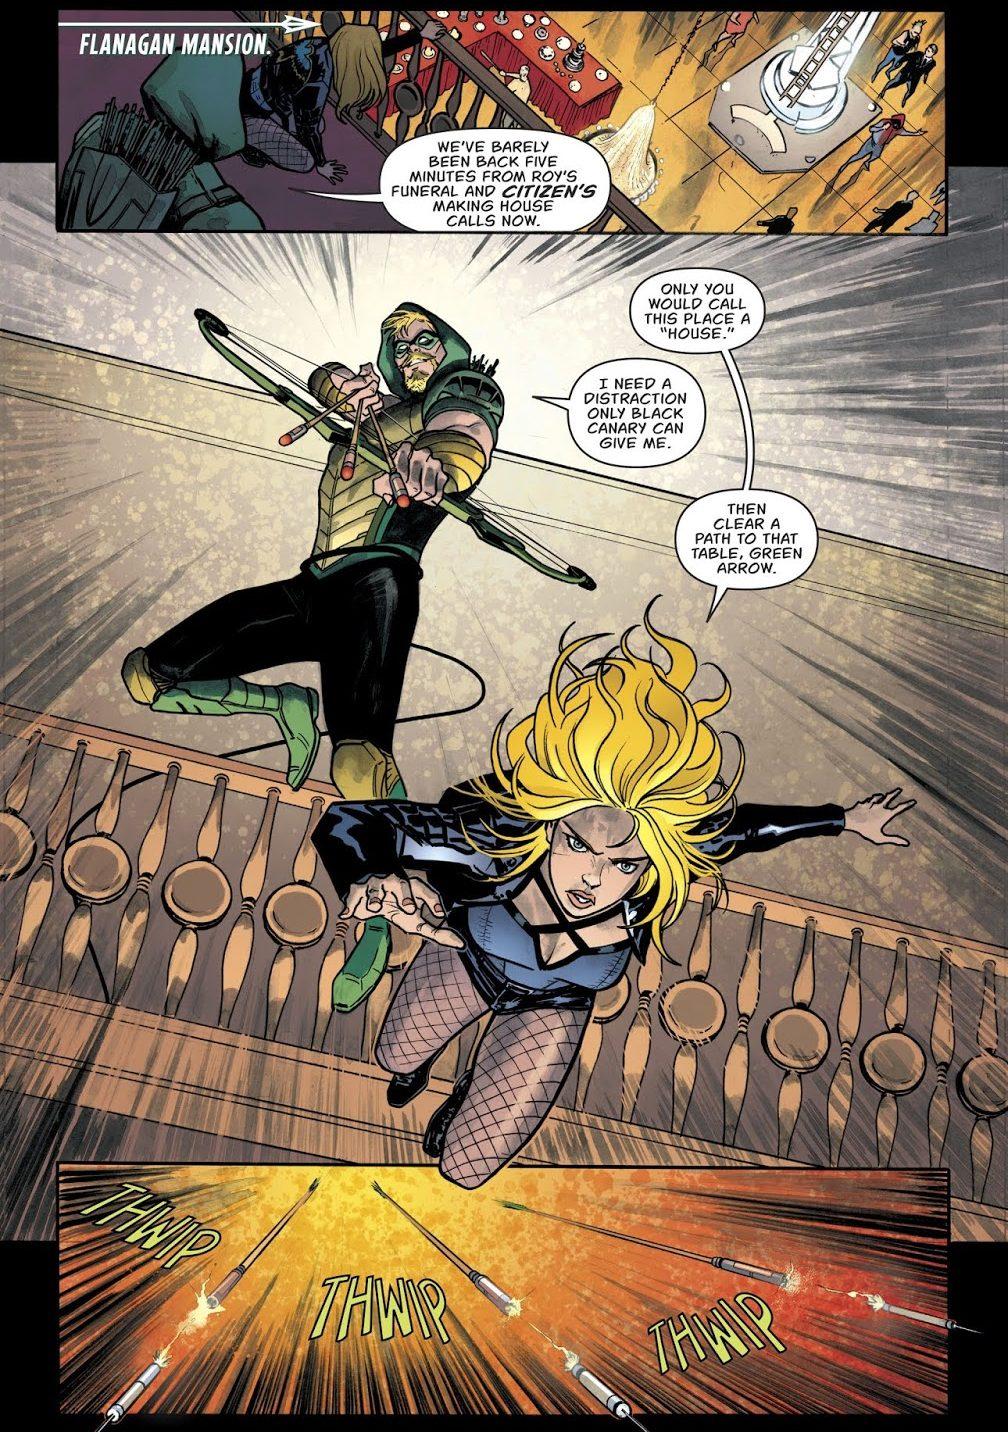 Green Arrow And Black Canary (Green Arrow Vol. 6 #46)